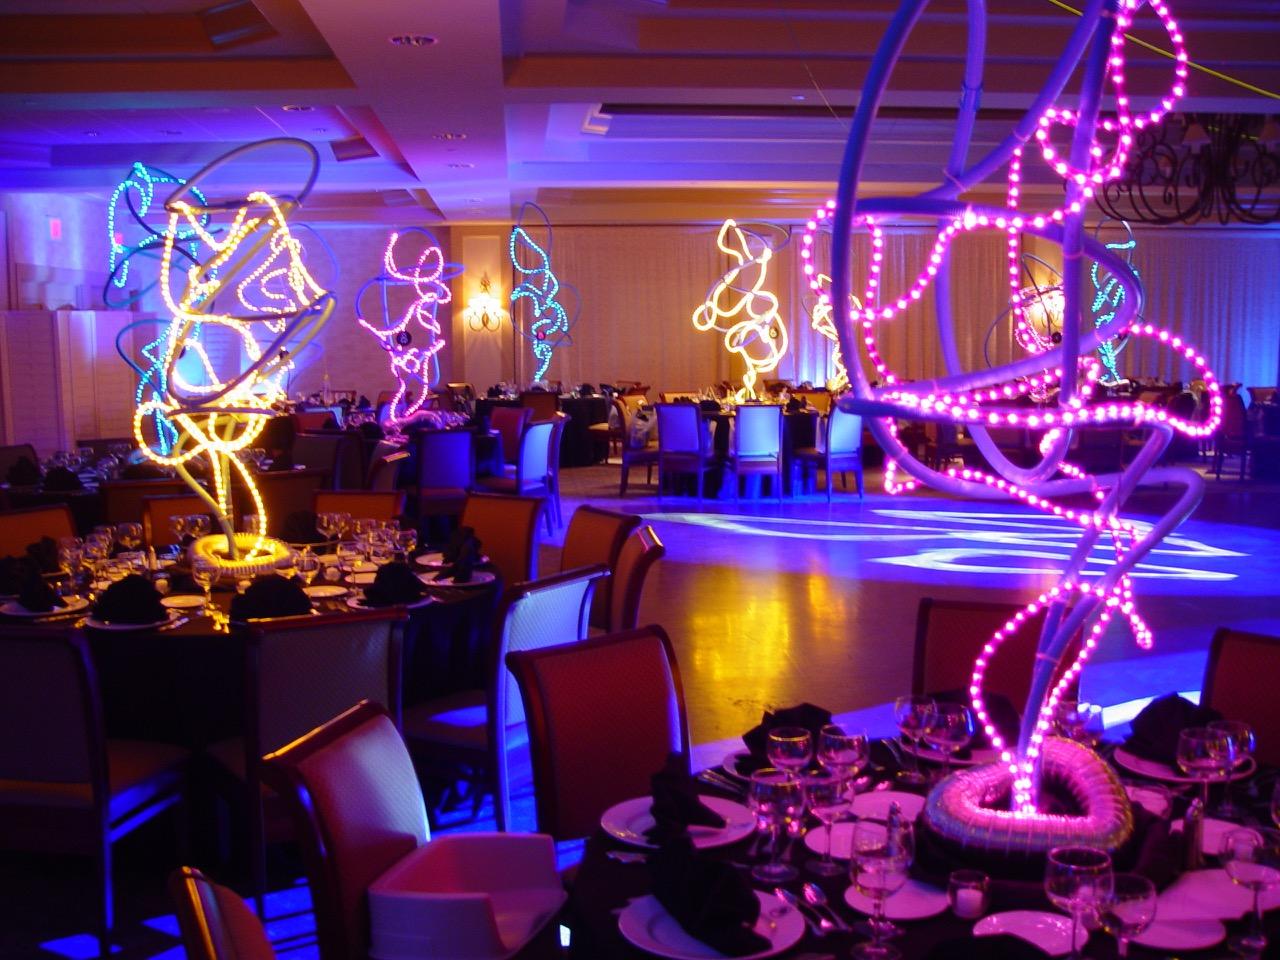 Event+Decor+Design+Lighting+NJ+NYC+Eggsotic+Events+NJs+Best+Event+Decorator+Event+Lighting+Event+Design+Wedding+Bar+Mitzvah+Bat+Mitzvah+Gala+Fundraiser+29.jpg